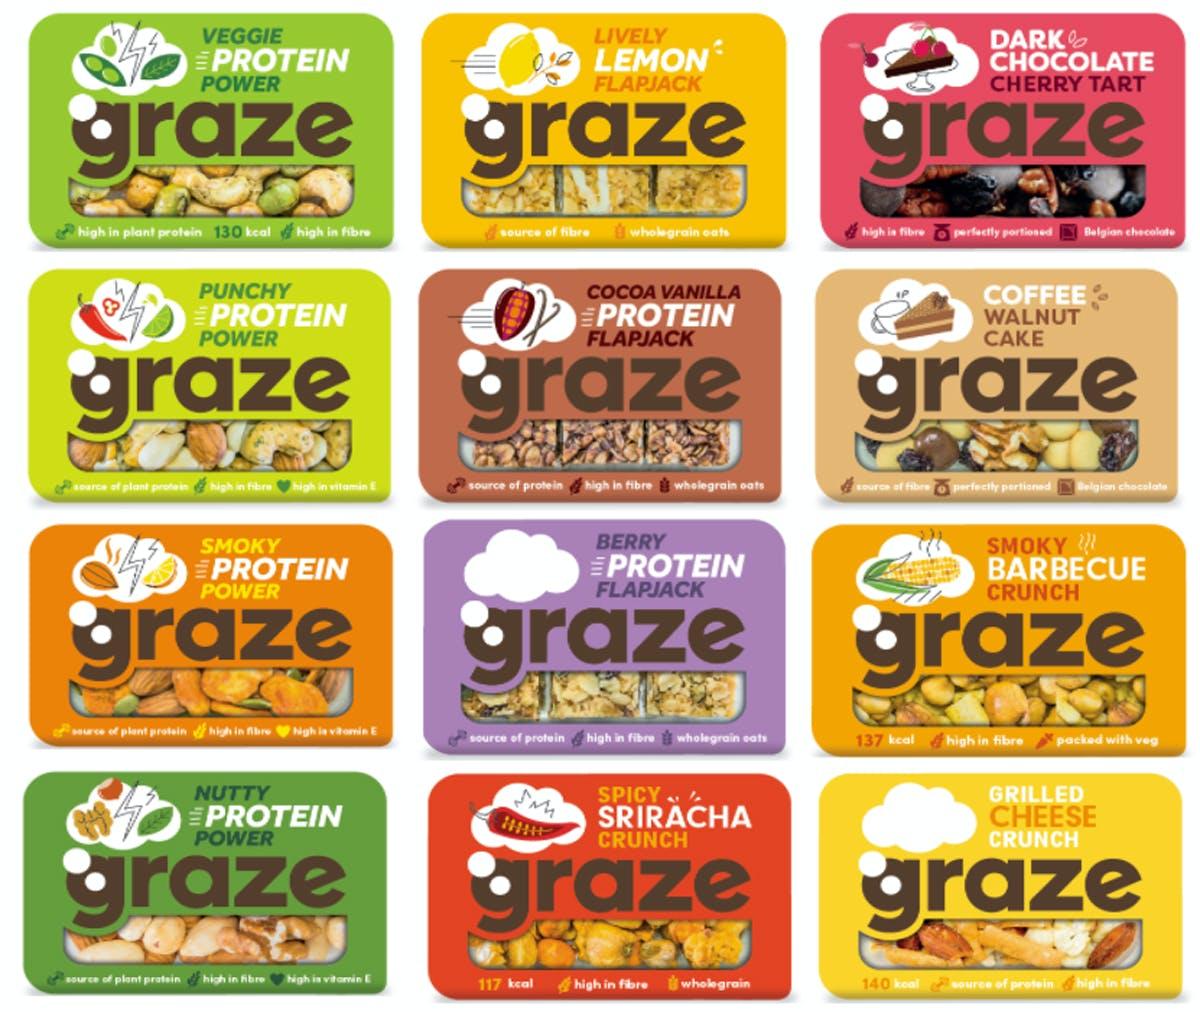 Graze healthy snacking brand, Unilever